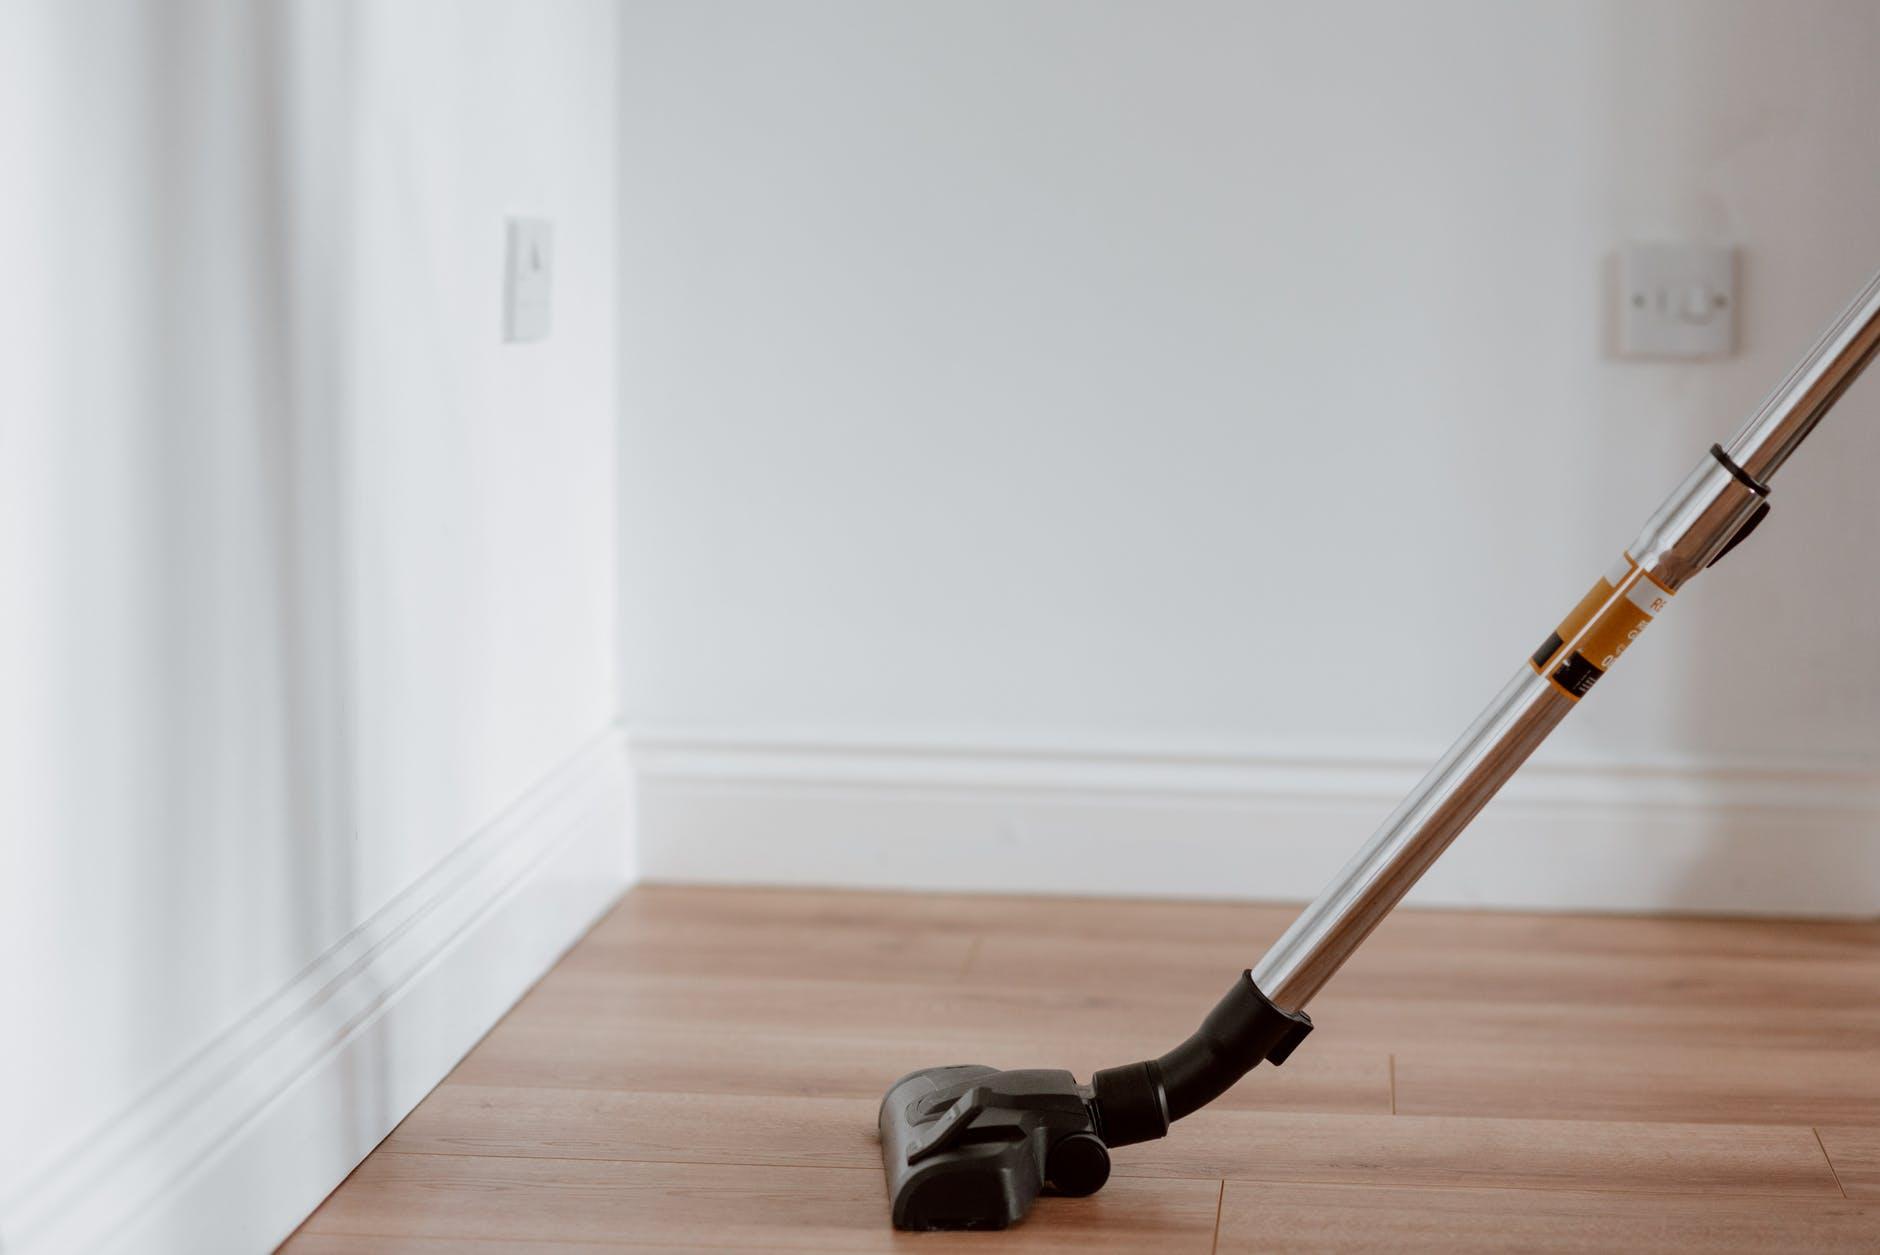 Stick vacuum on light wooden floor